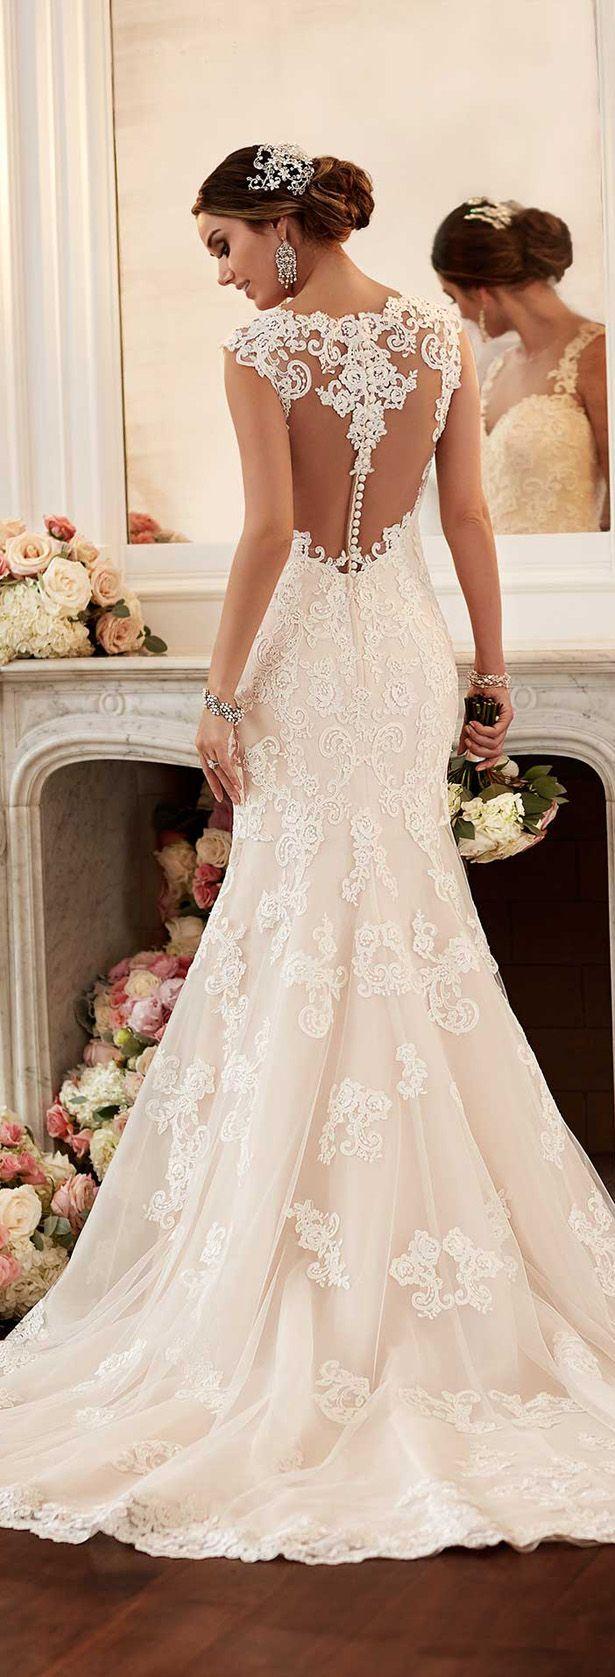 wedding gowns Mesmerizing Wedding Dress Ideas That Would Make You A Fairy Princess